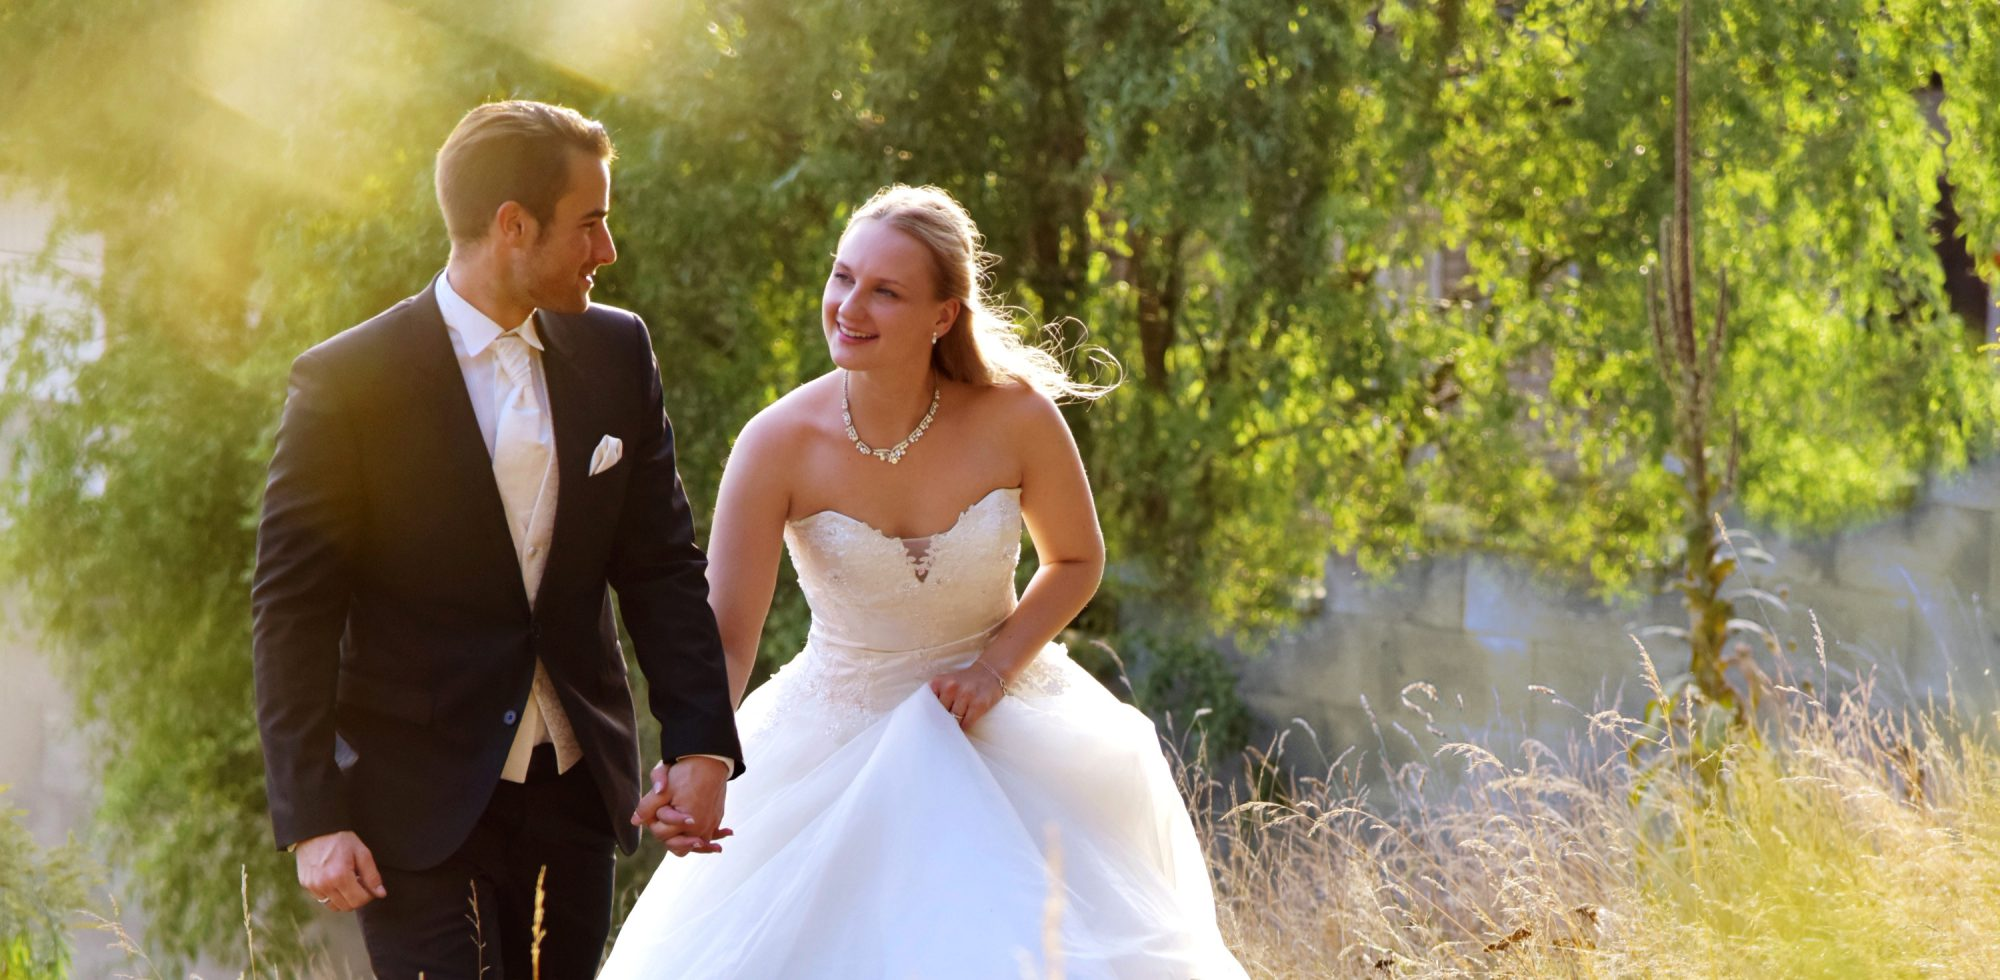 Hochzeitsfotograf Kassel Gunda Kries